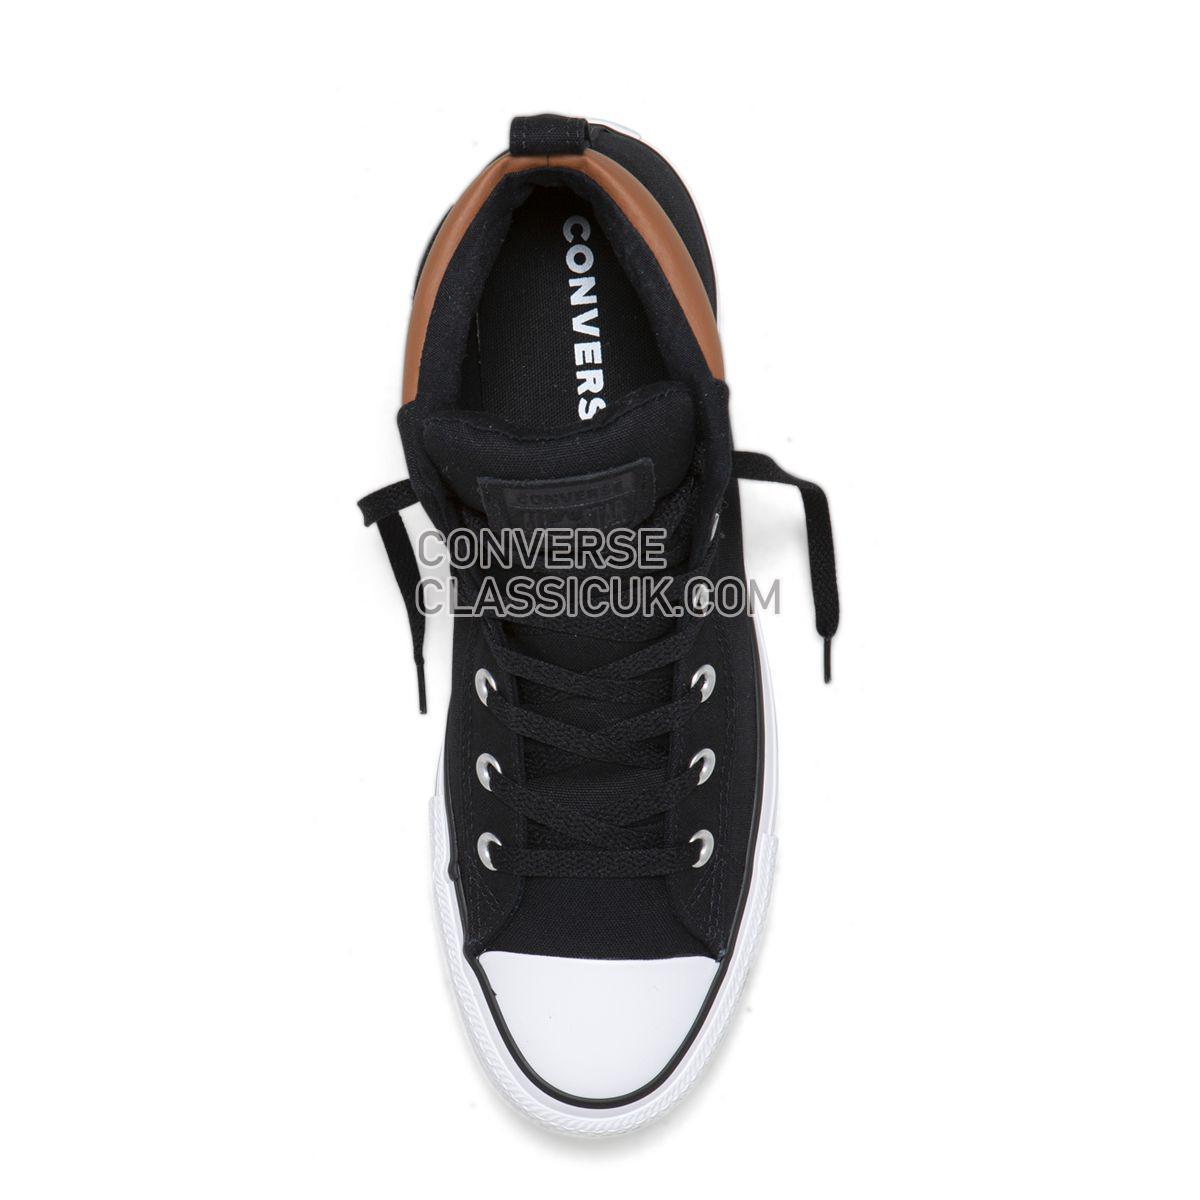 Converse Chuck Taylor All Star Street Space Explorer Mid Black Mens 165389 Black/Warm Tan/White Shoes